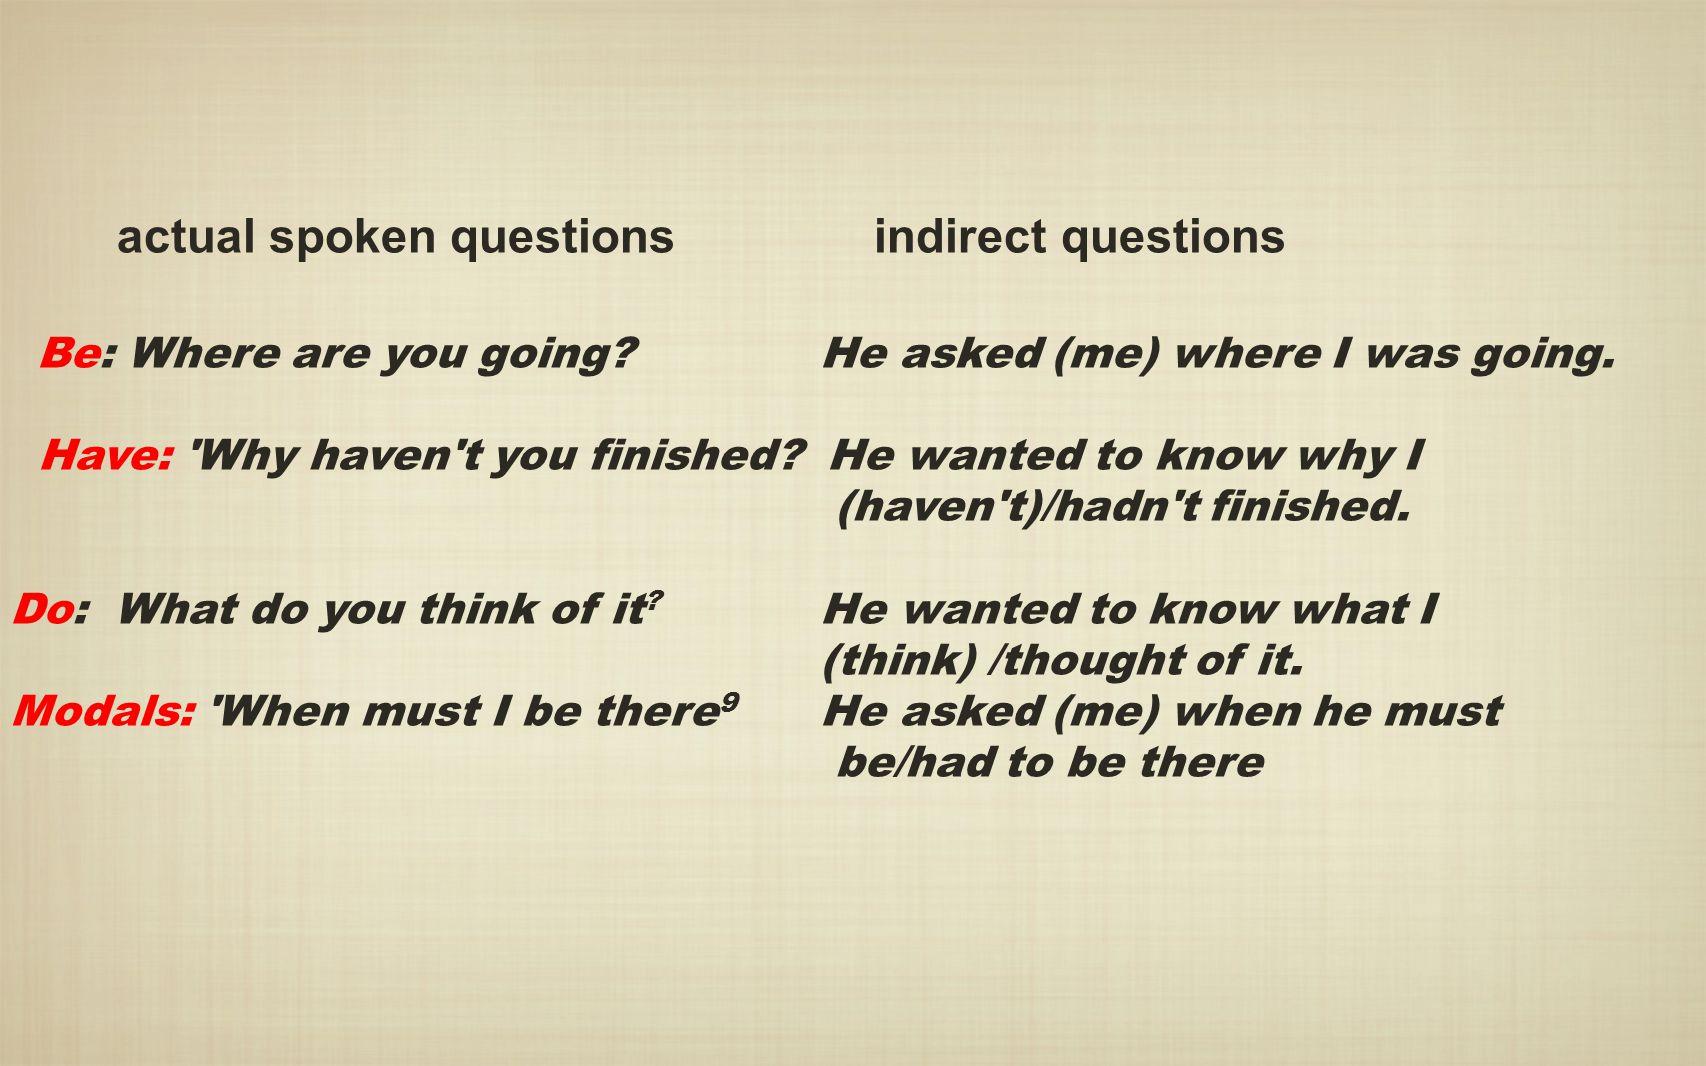 actual spoken questions indirect questions